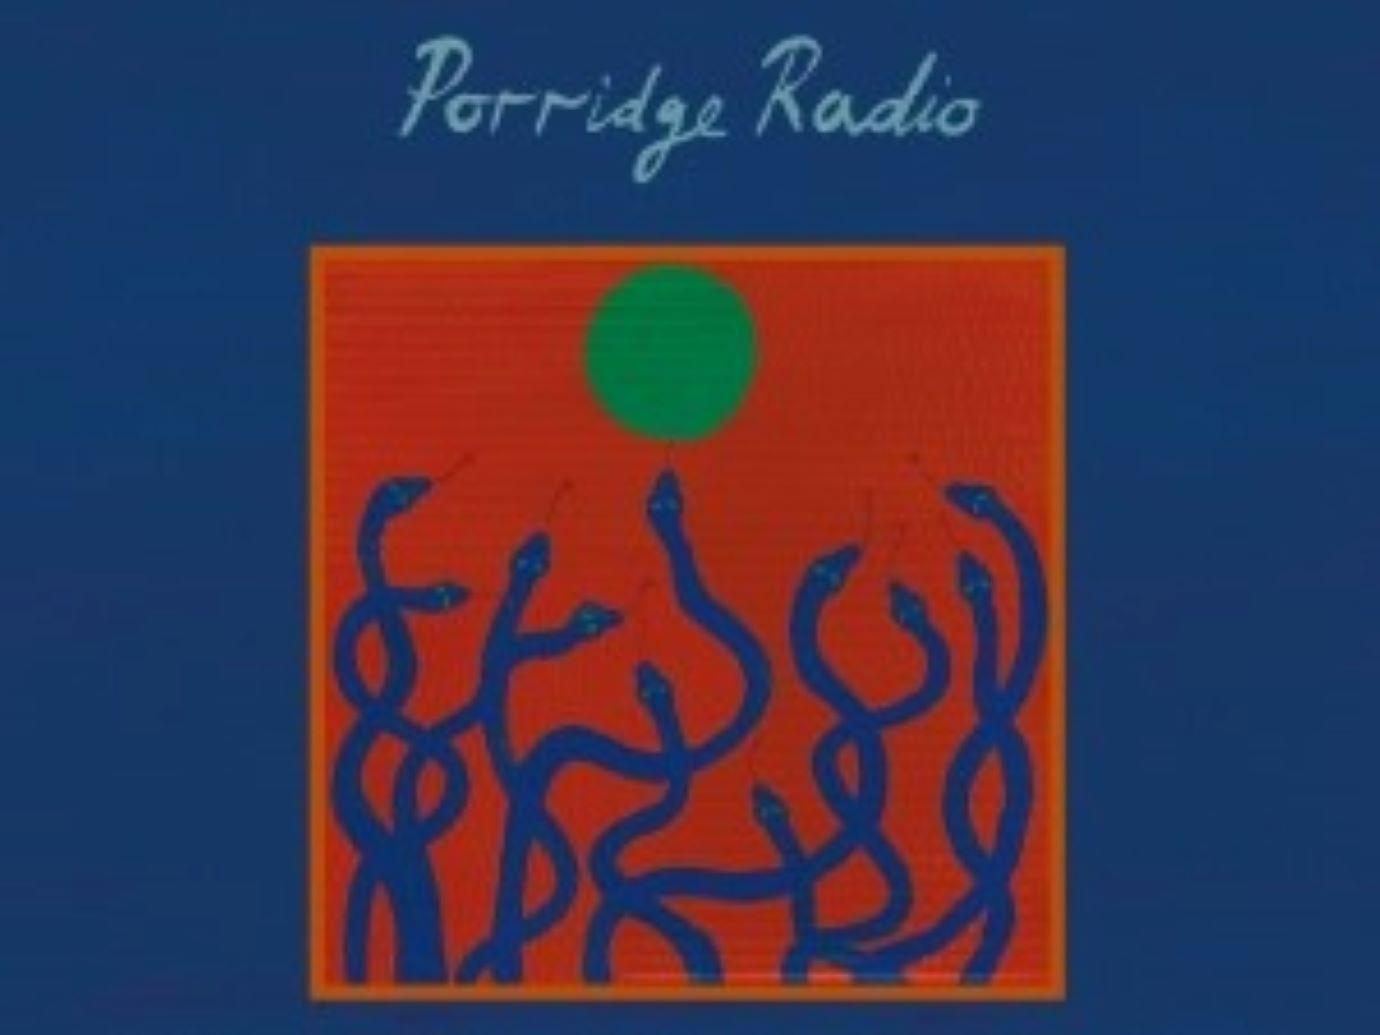 Album der Woche: Porridge Radio – Every Bad